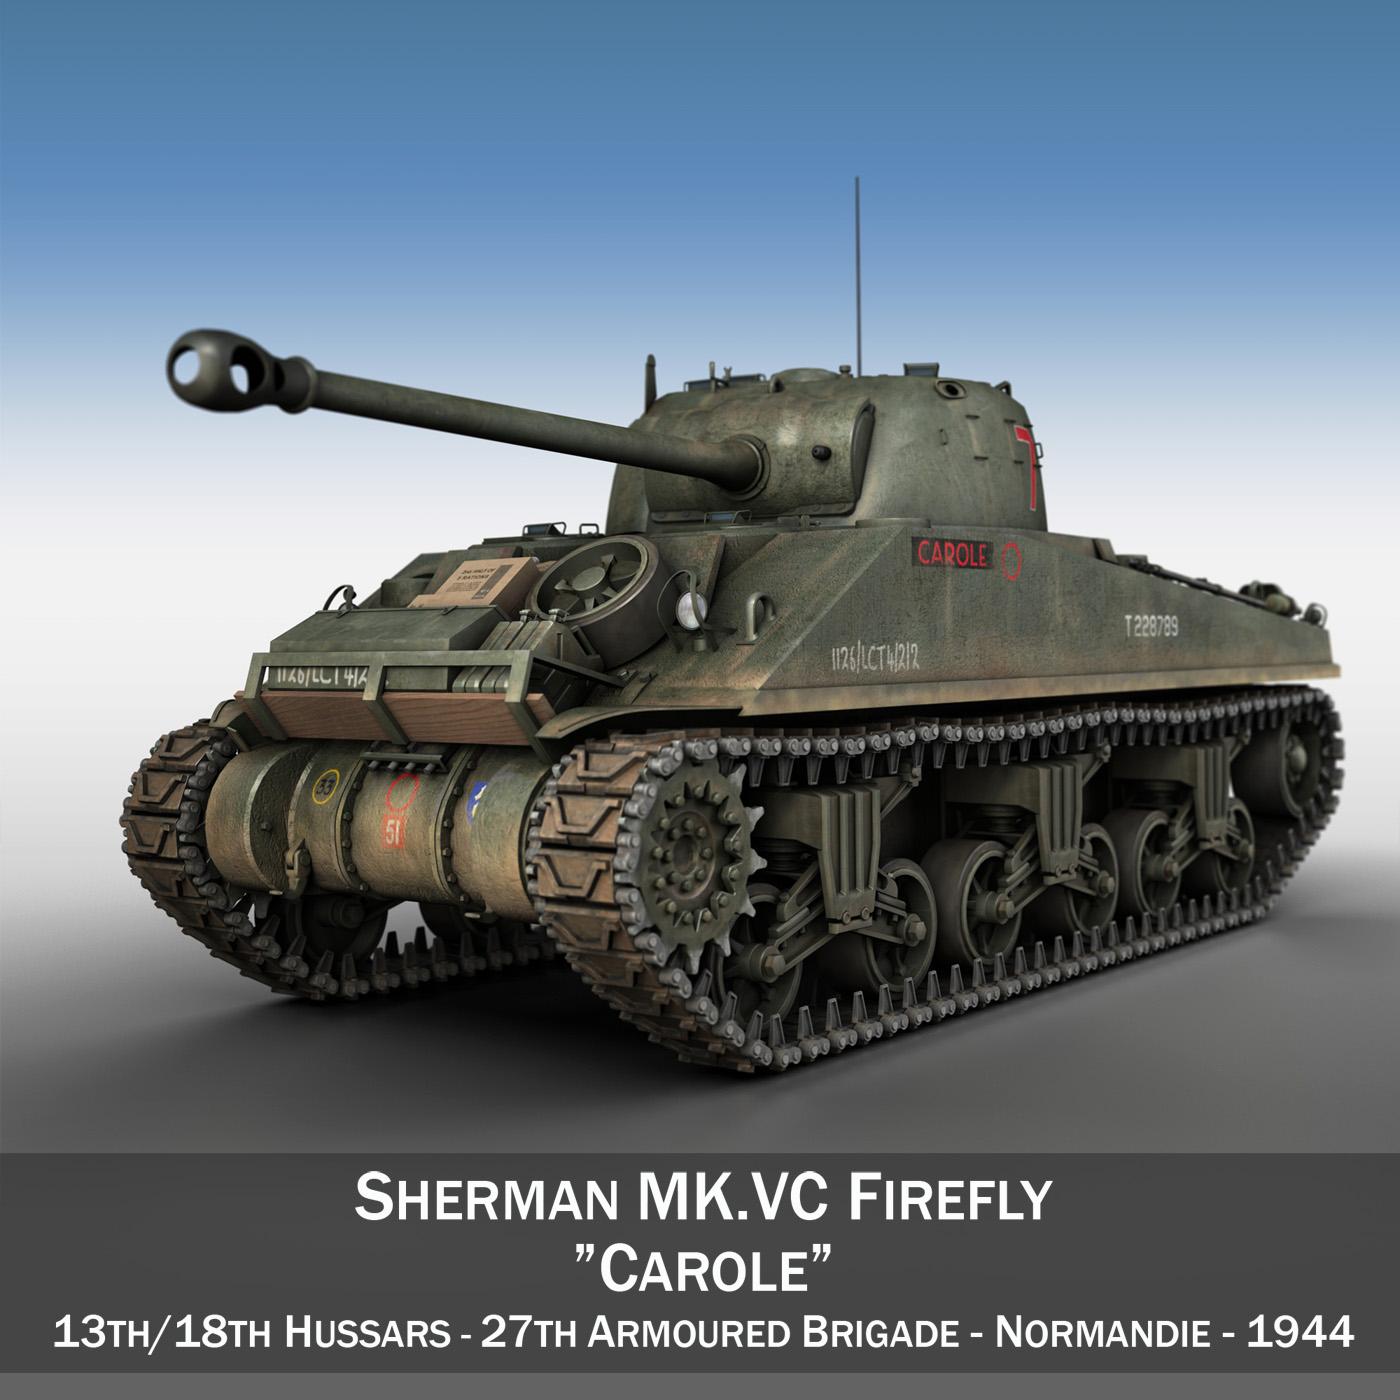 sherman mk vc firefly - carole samhail 3d 3ds fbx lw lw obj cxNUMXd 4